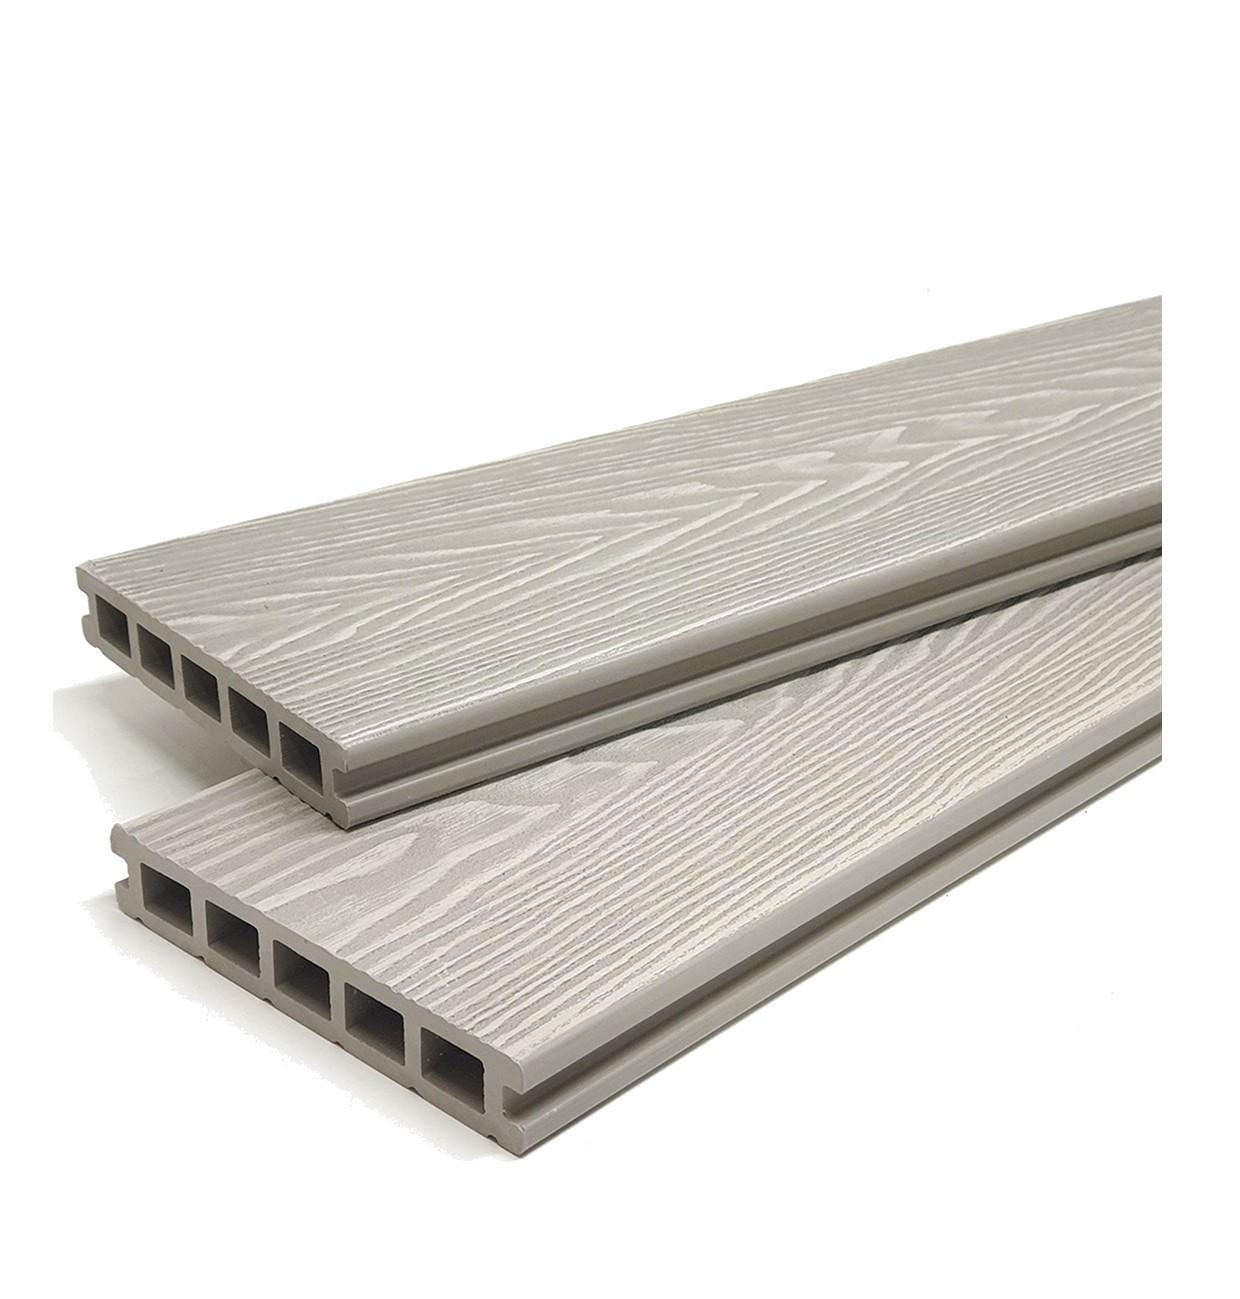 Ash Grey Reversible Woodgrain Composite Decking Kit 3.6m Boards (Price per sqm/£27 per board)